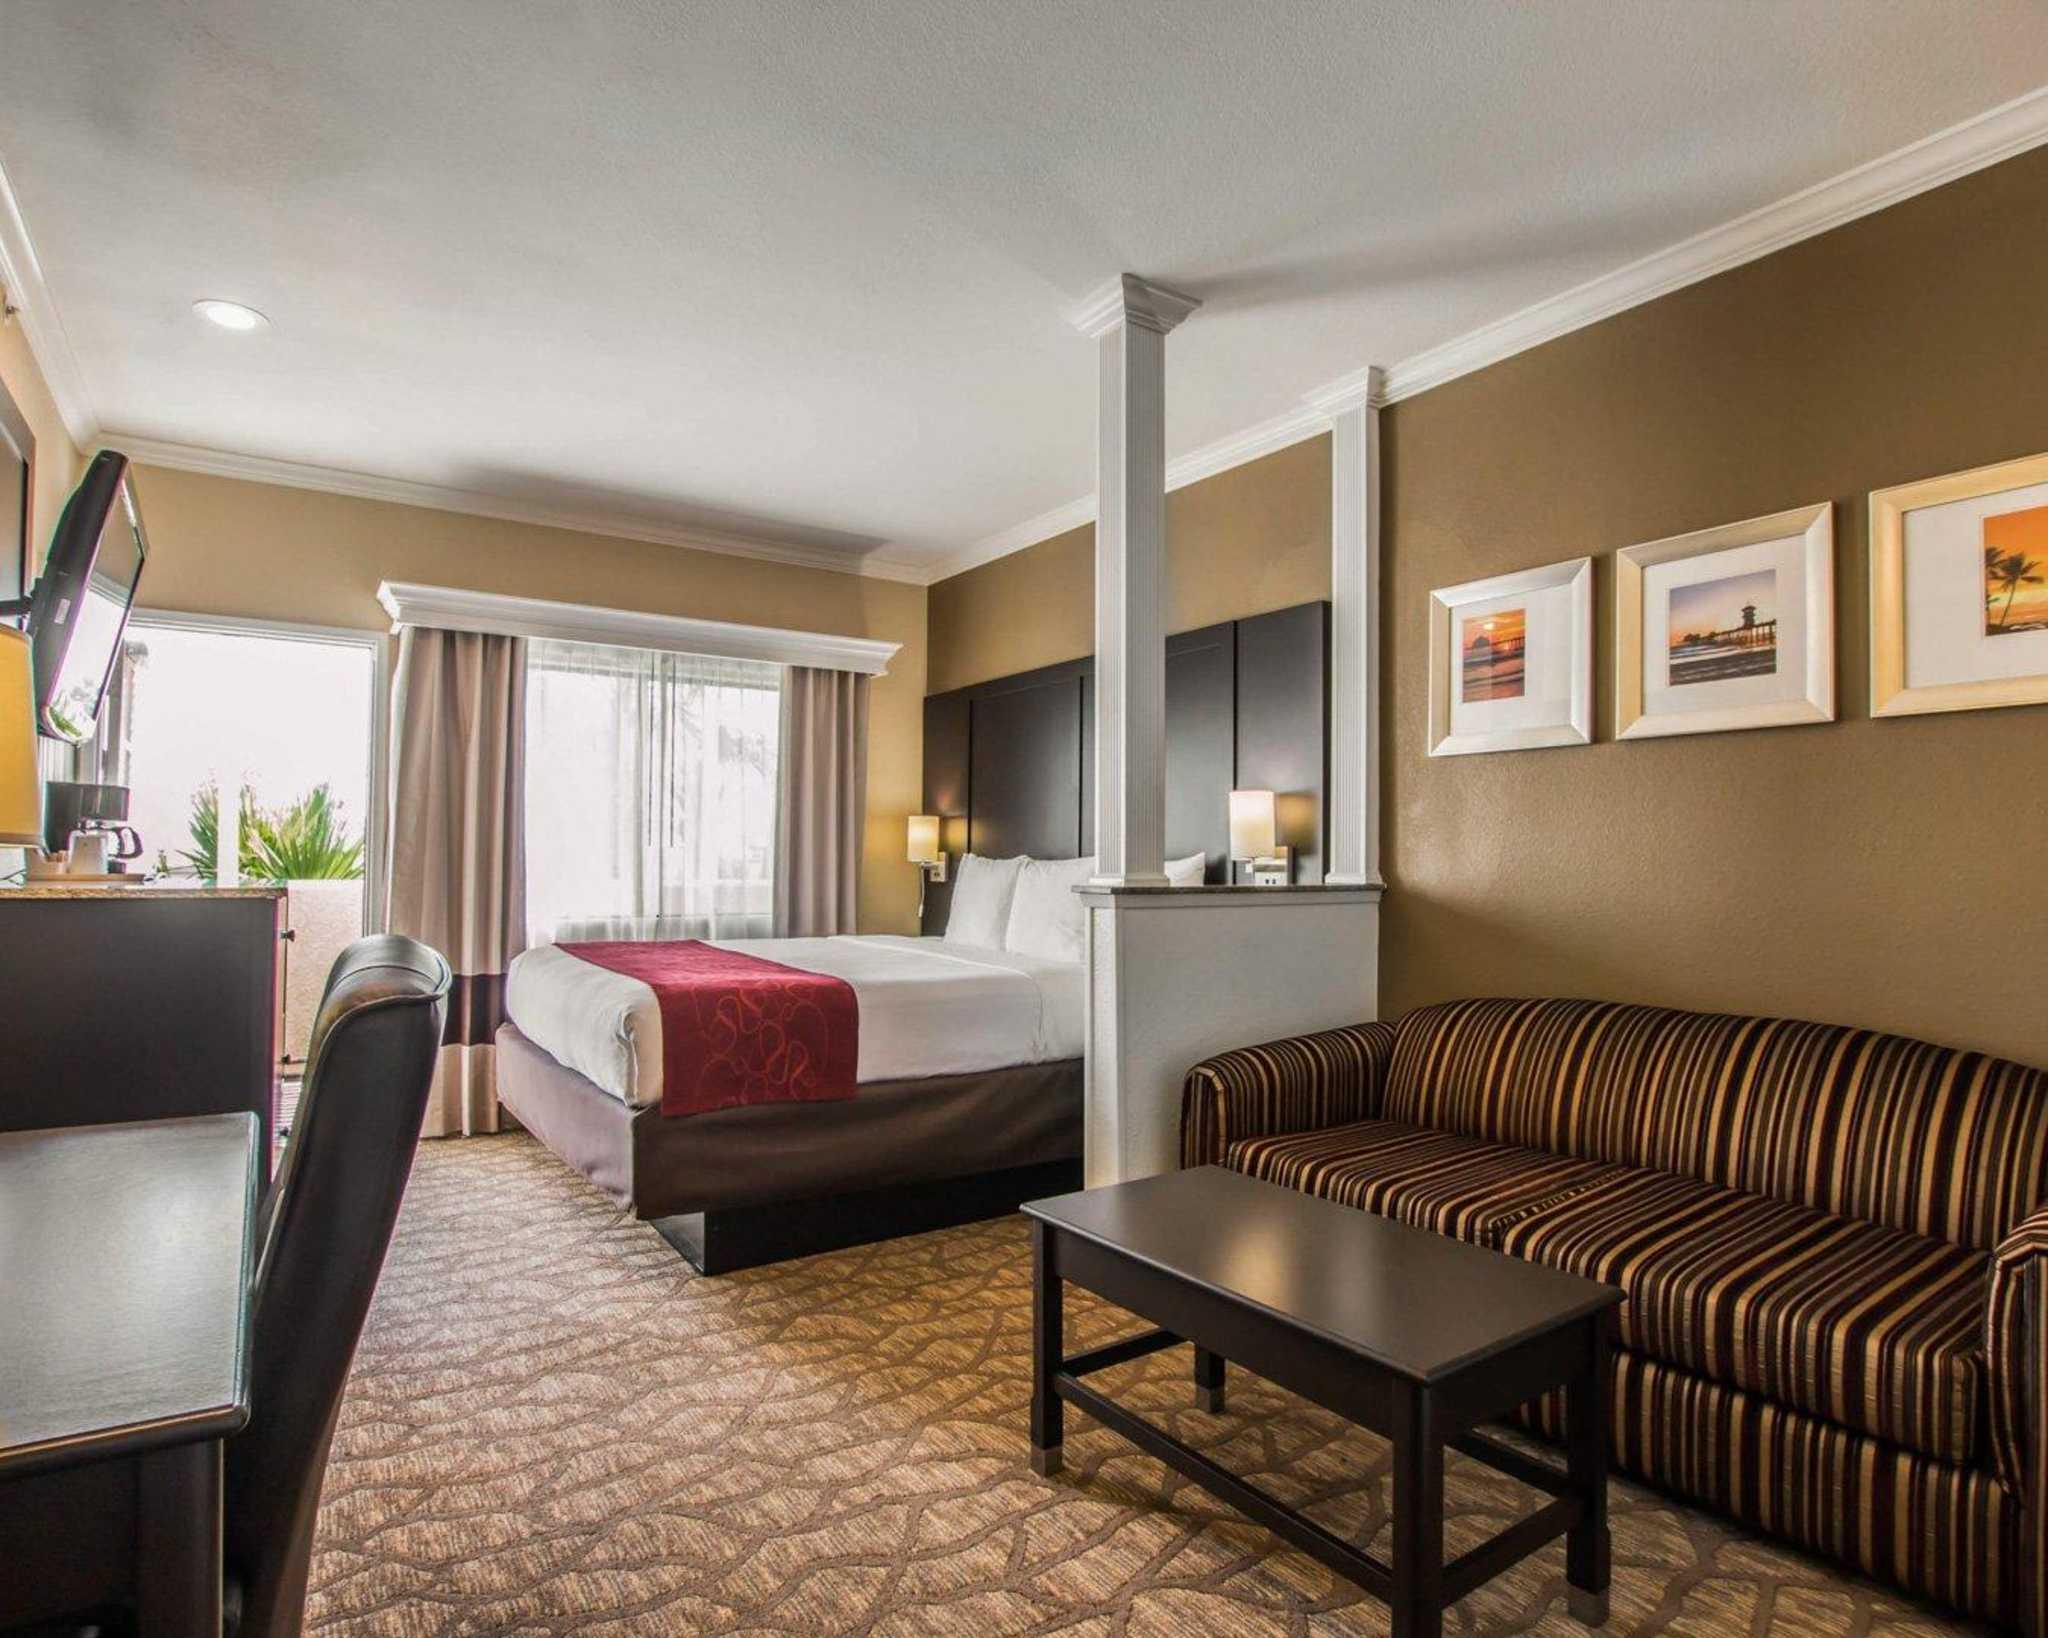 Comfort Suites Huntington Beach image 21